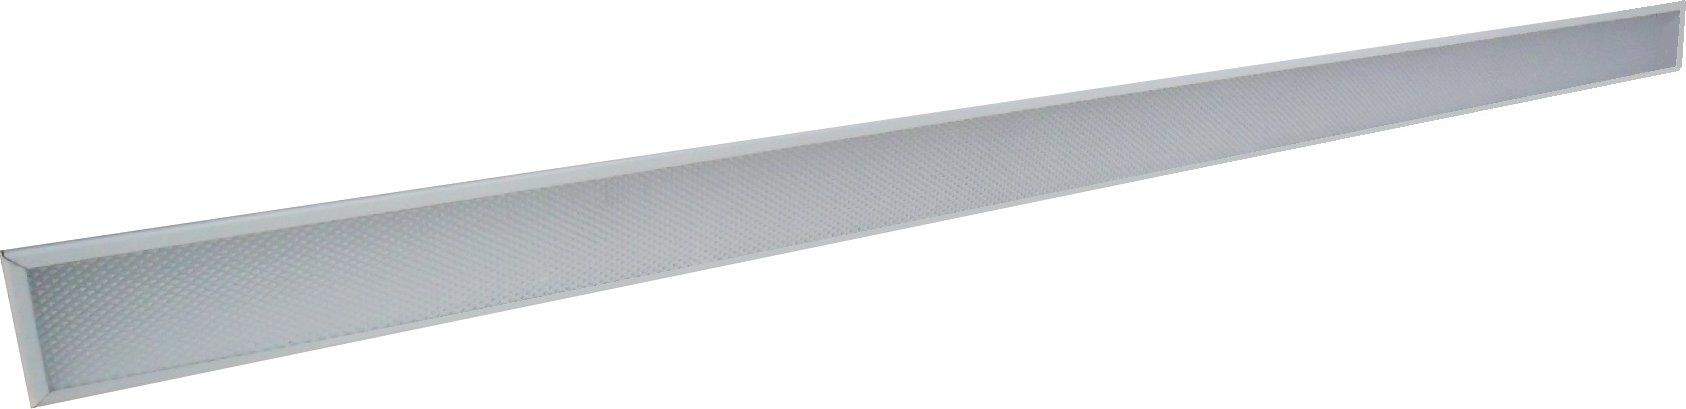 Светильник RTL SVT-RTL-X-900-40W-PR